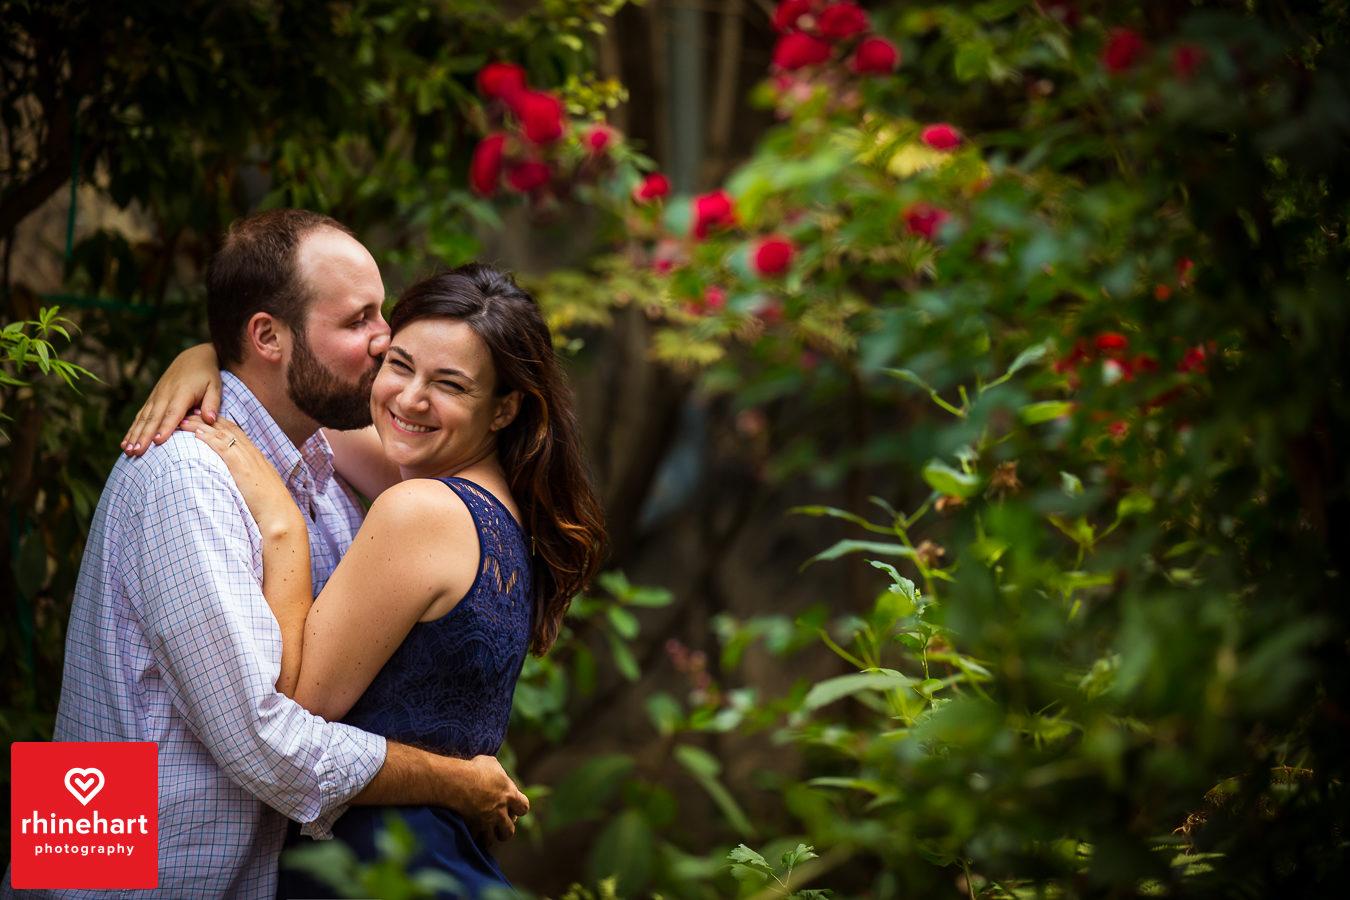 boat-house-row-philadelphia-philly-creative-engagement-wedding-photographers-10